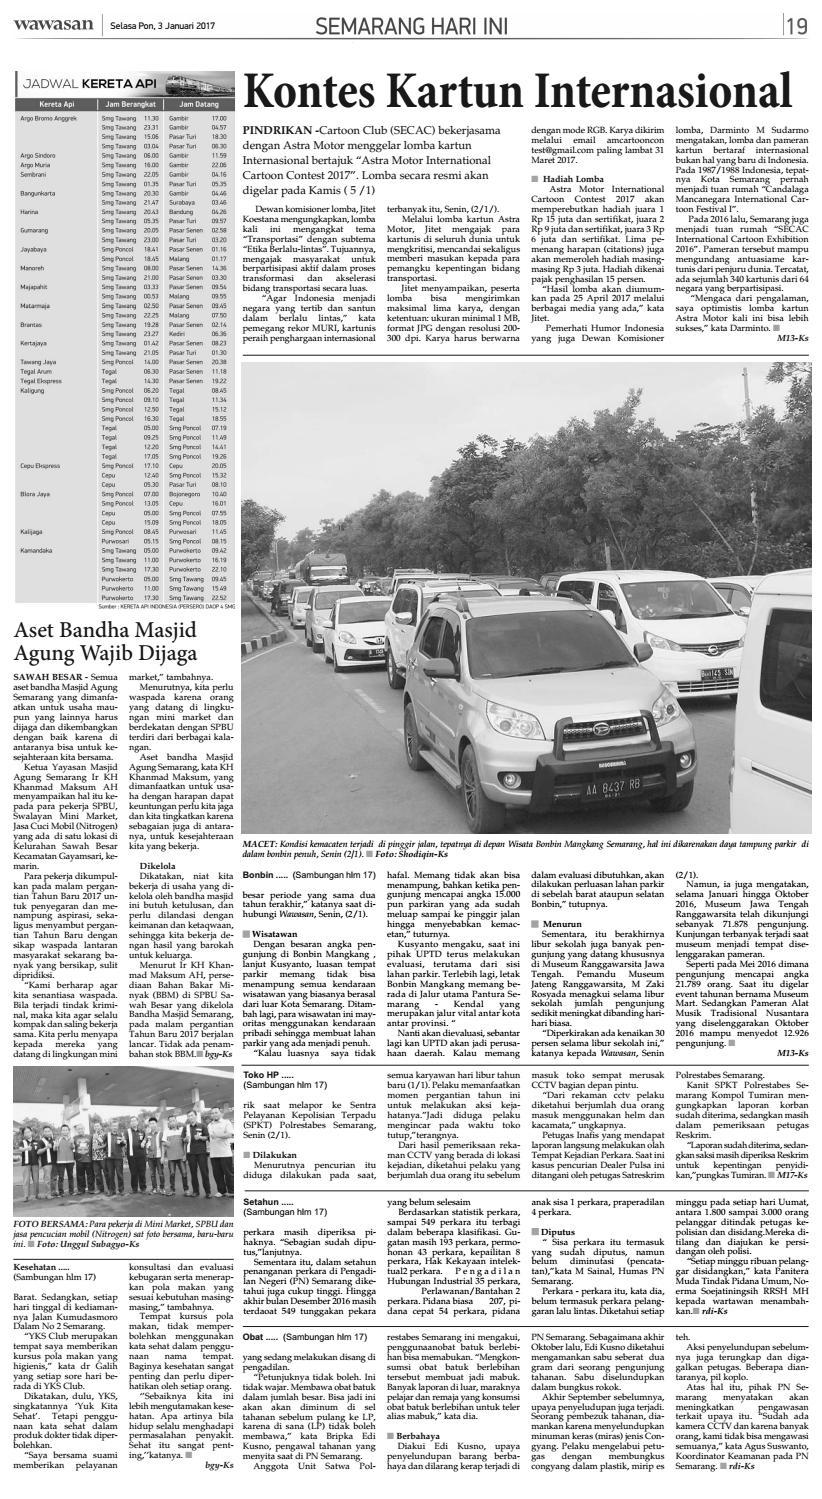 Wawasan 03 Januari 2017 By Koran Pagi Wawasan Issuu